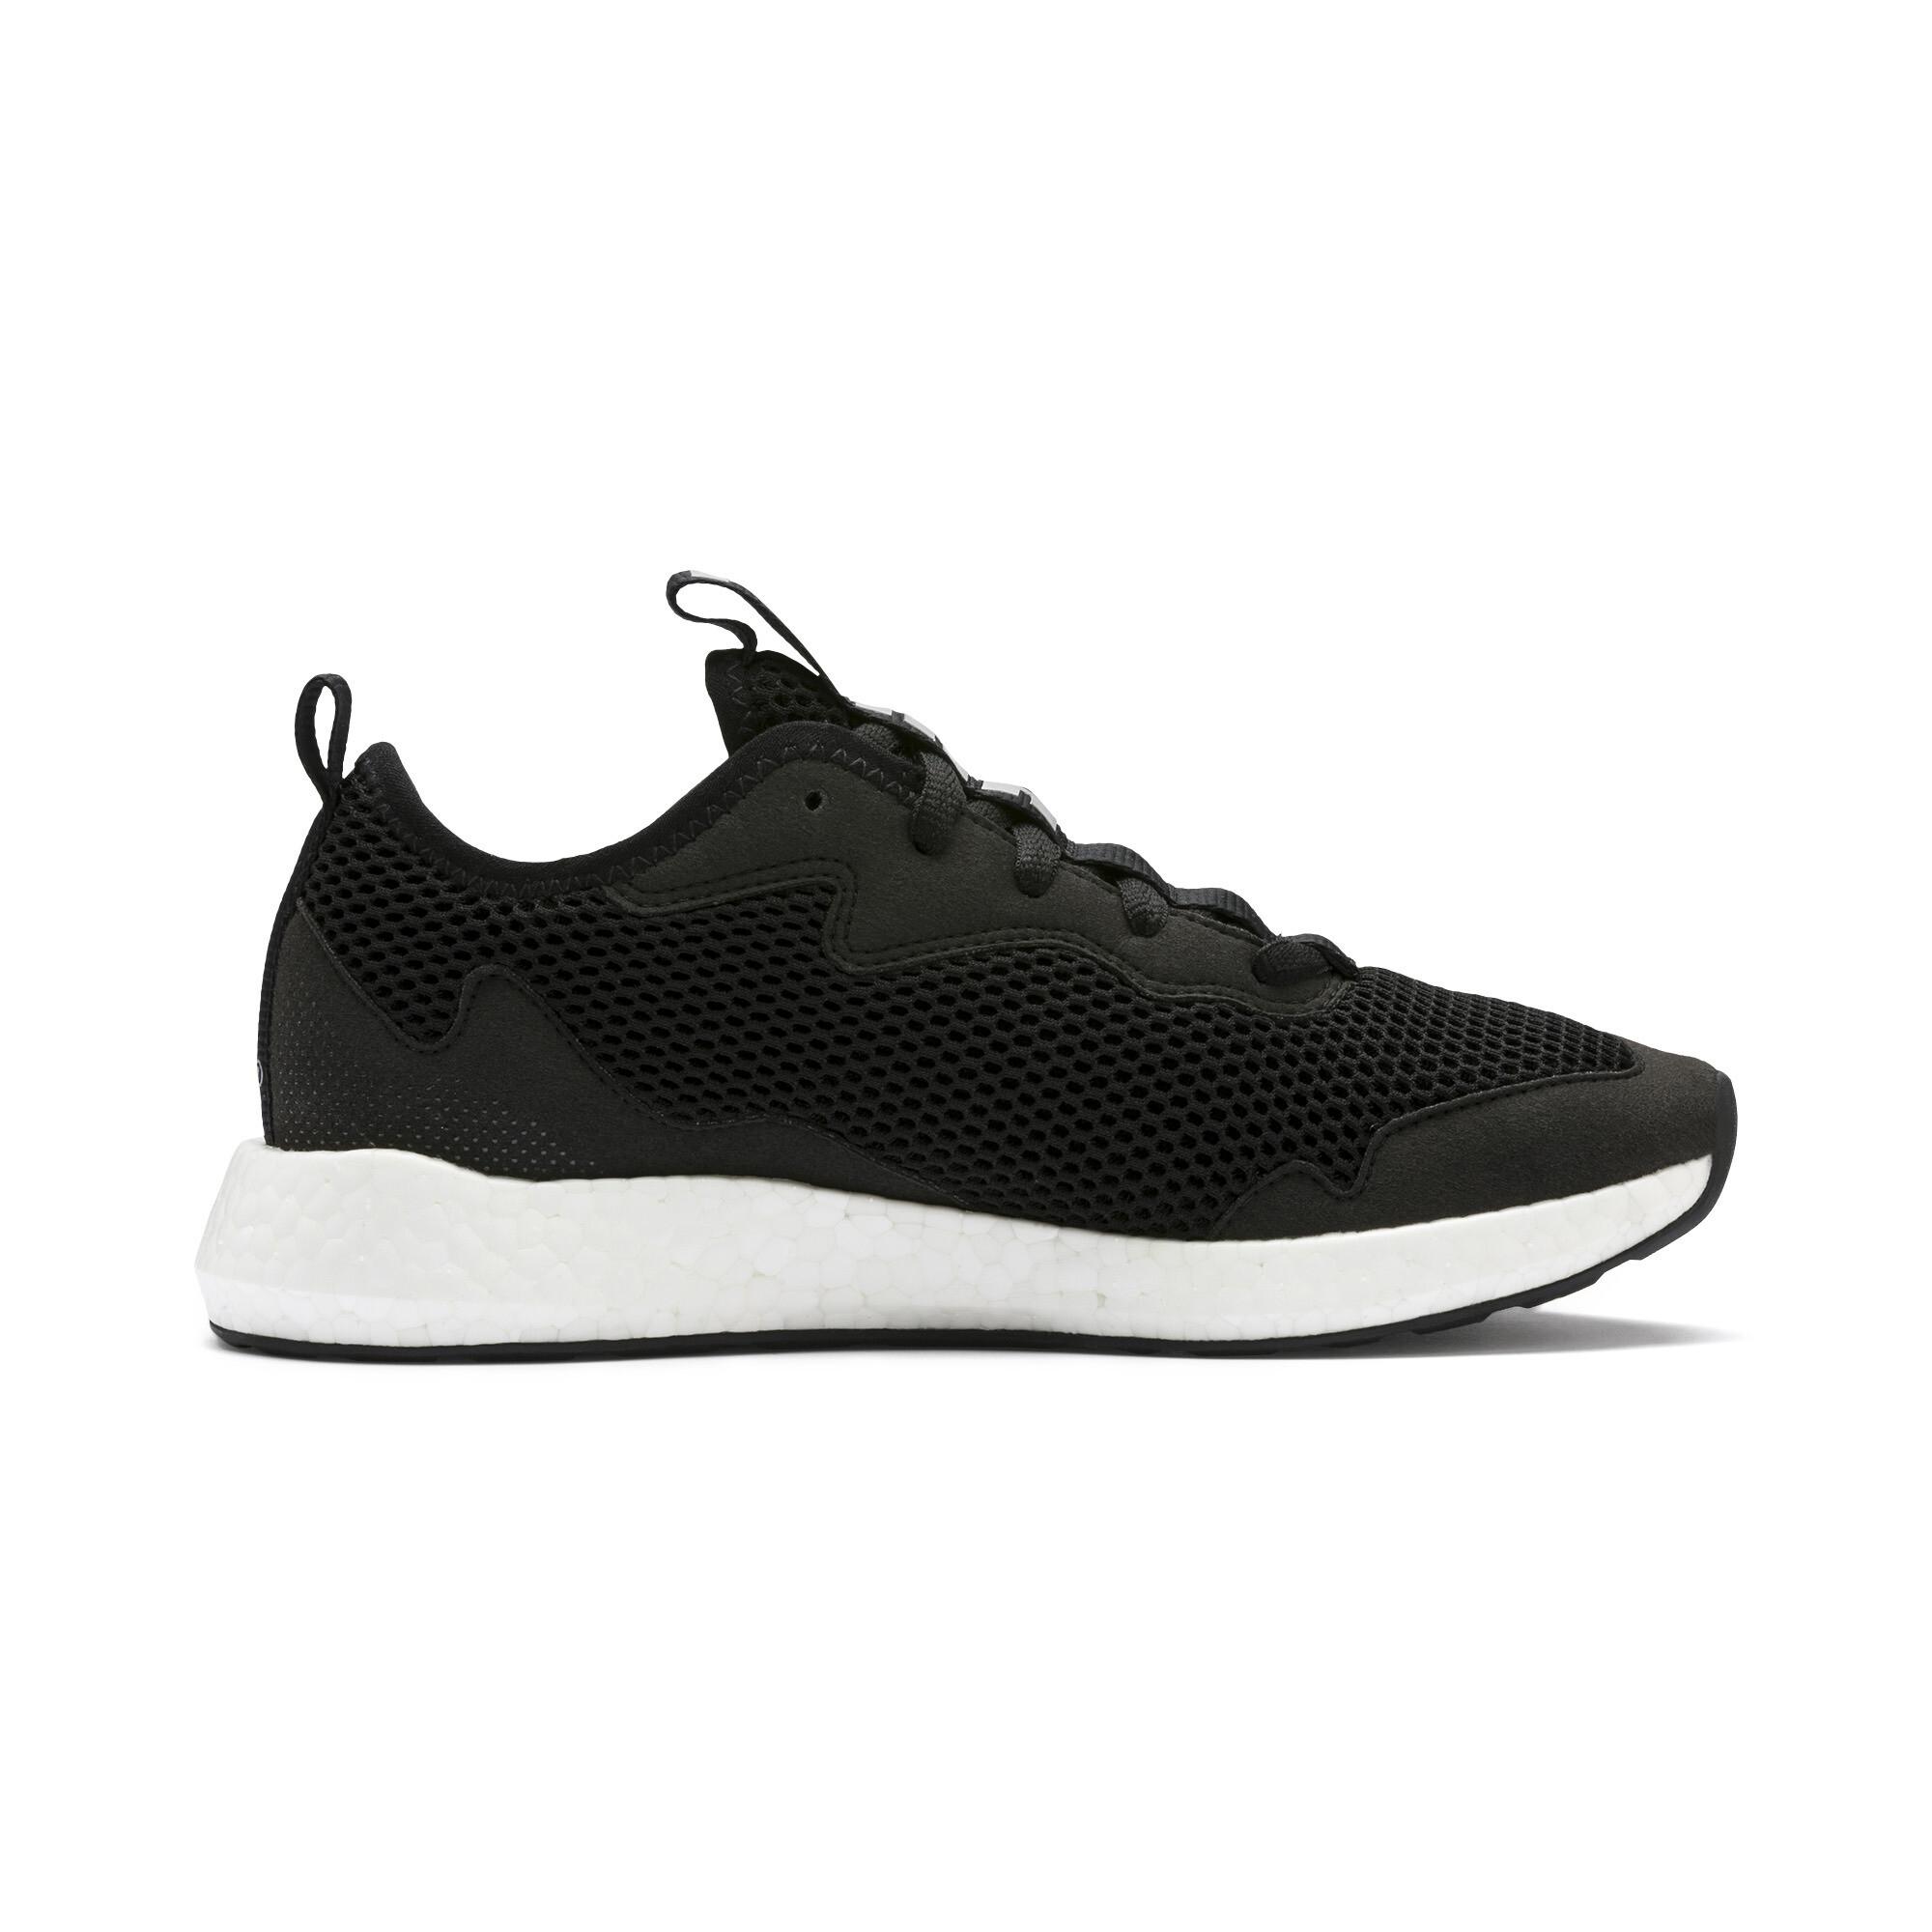 PUMA-Women-039-s-NRGY-Neko-Skim-Running-Shoes thumbnail 14